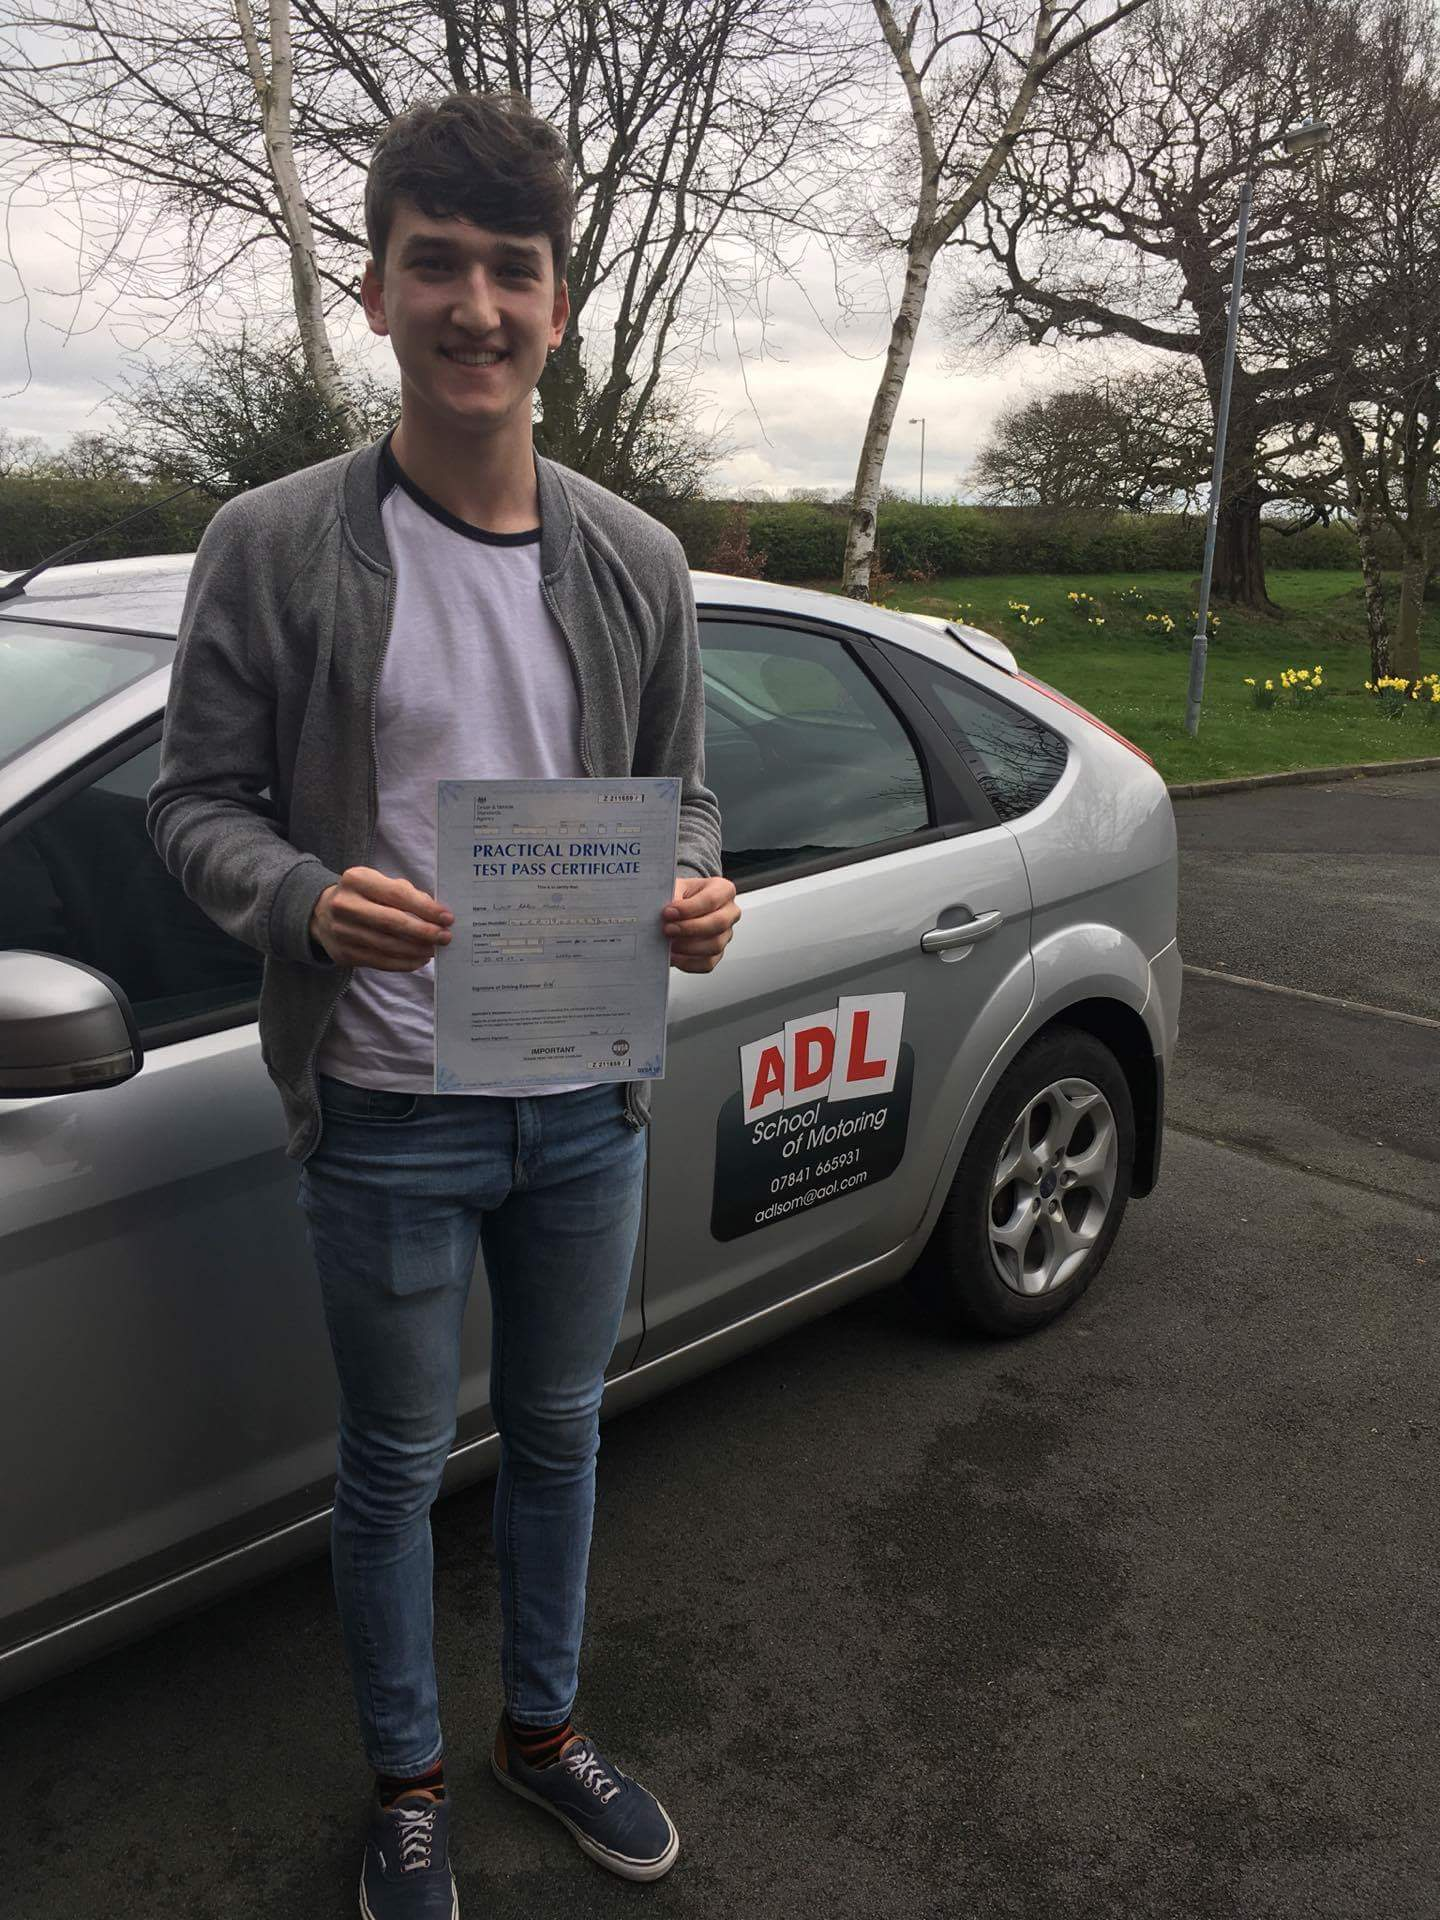 Mr Luke Morris passing his test at Wrexham driving test centre.